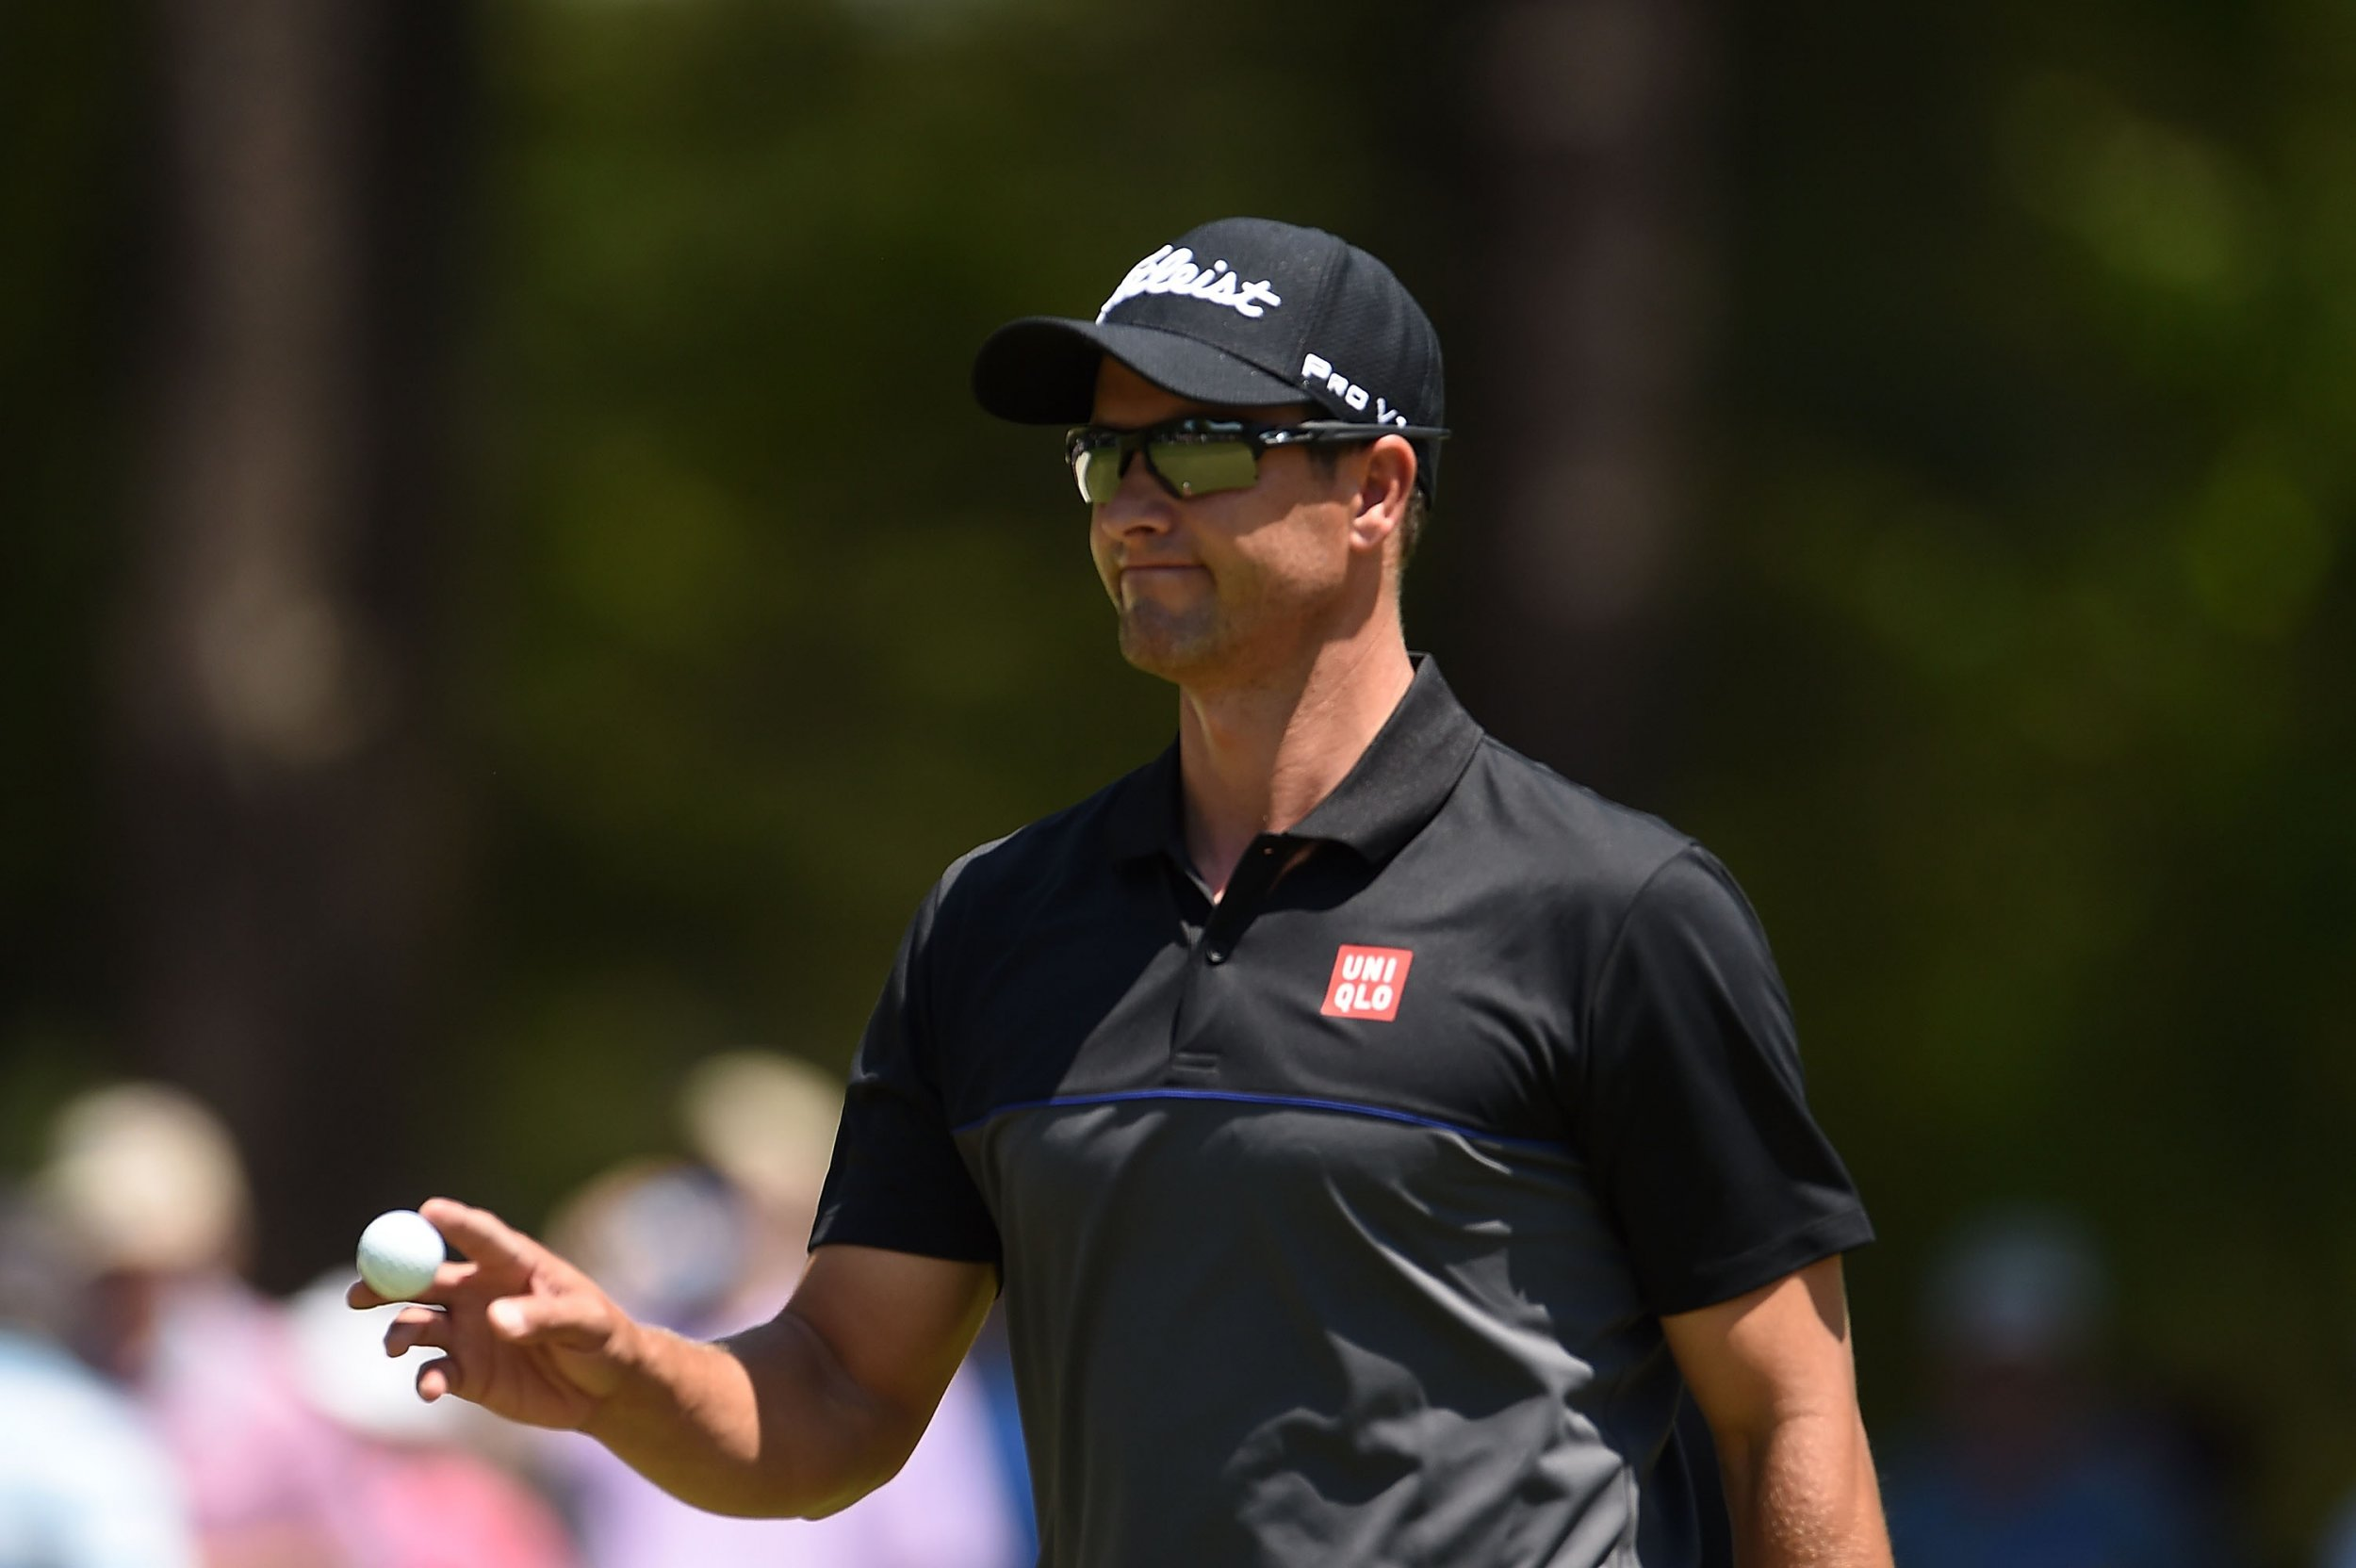 Golfer Adam Scott